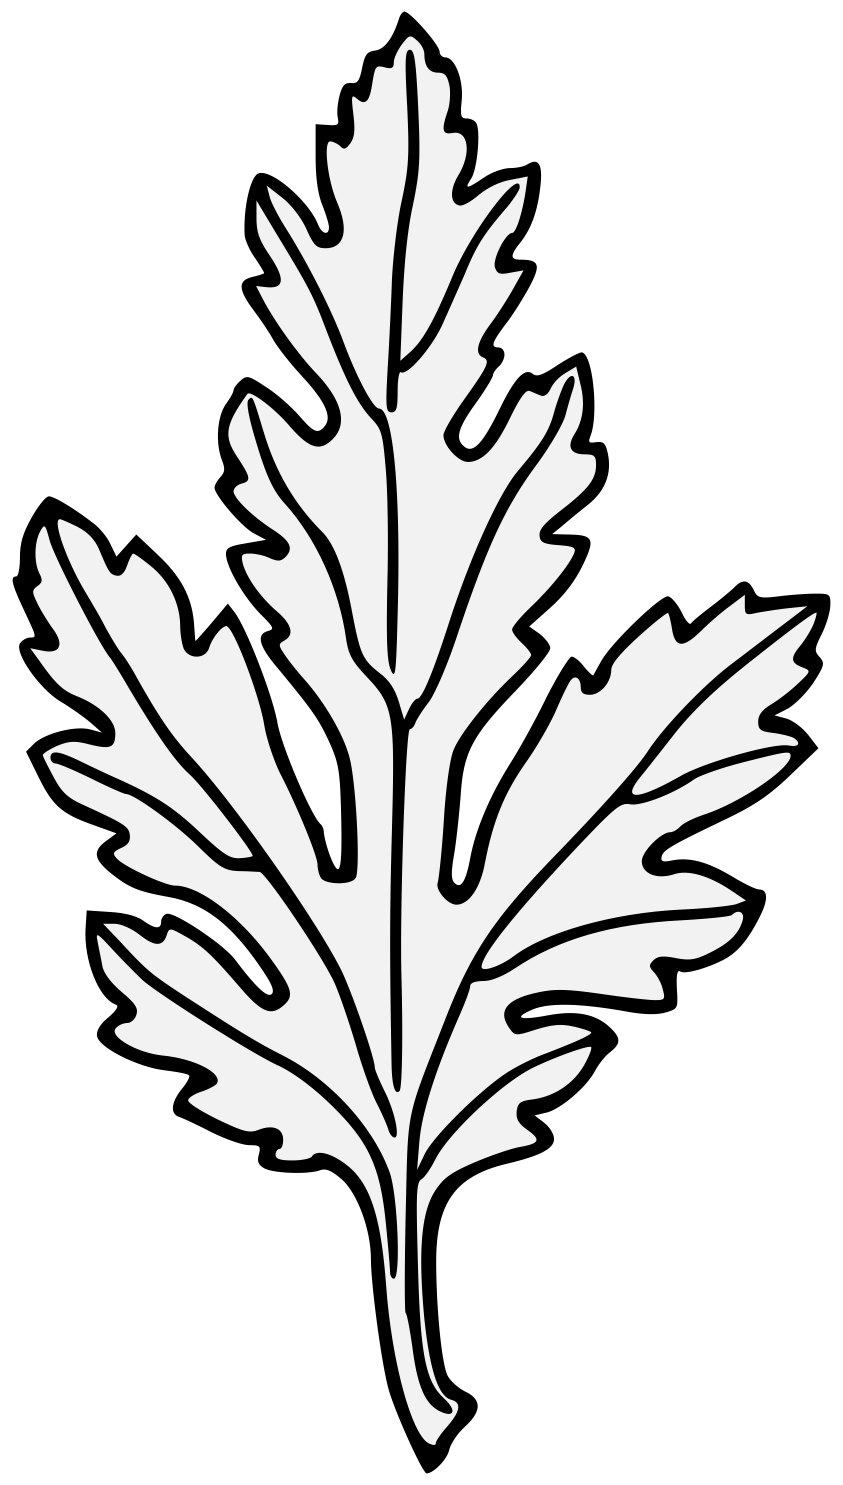 banner transparent stock chrysanthemum vector leave #91704253